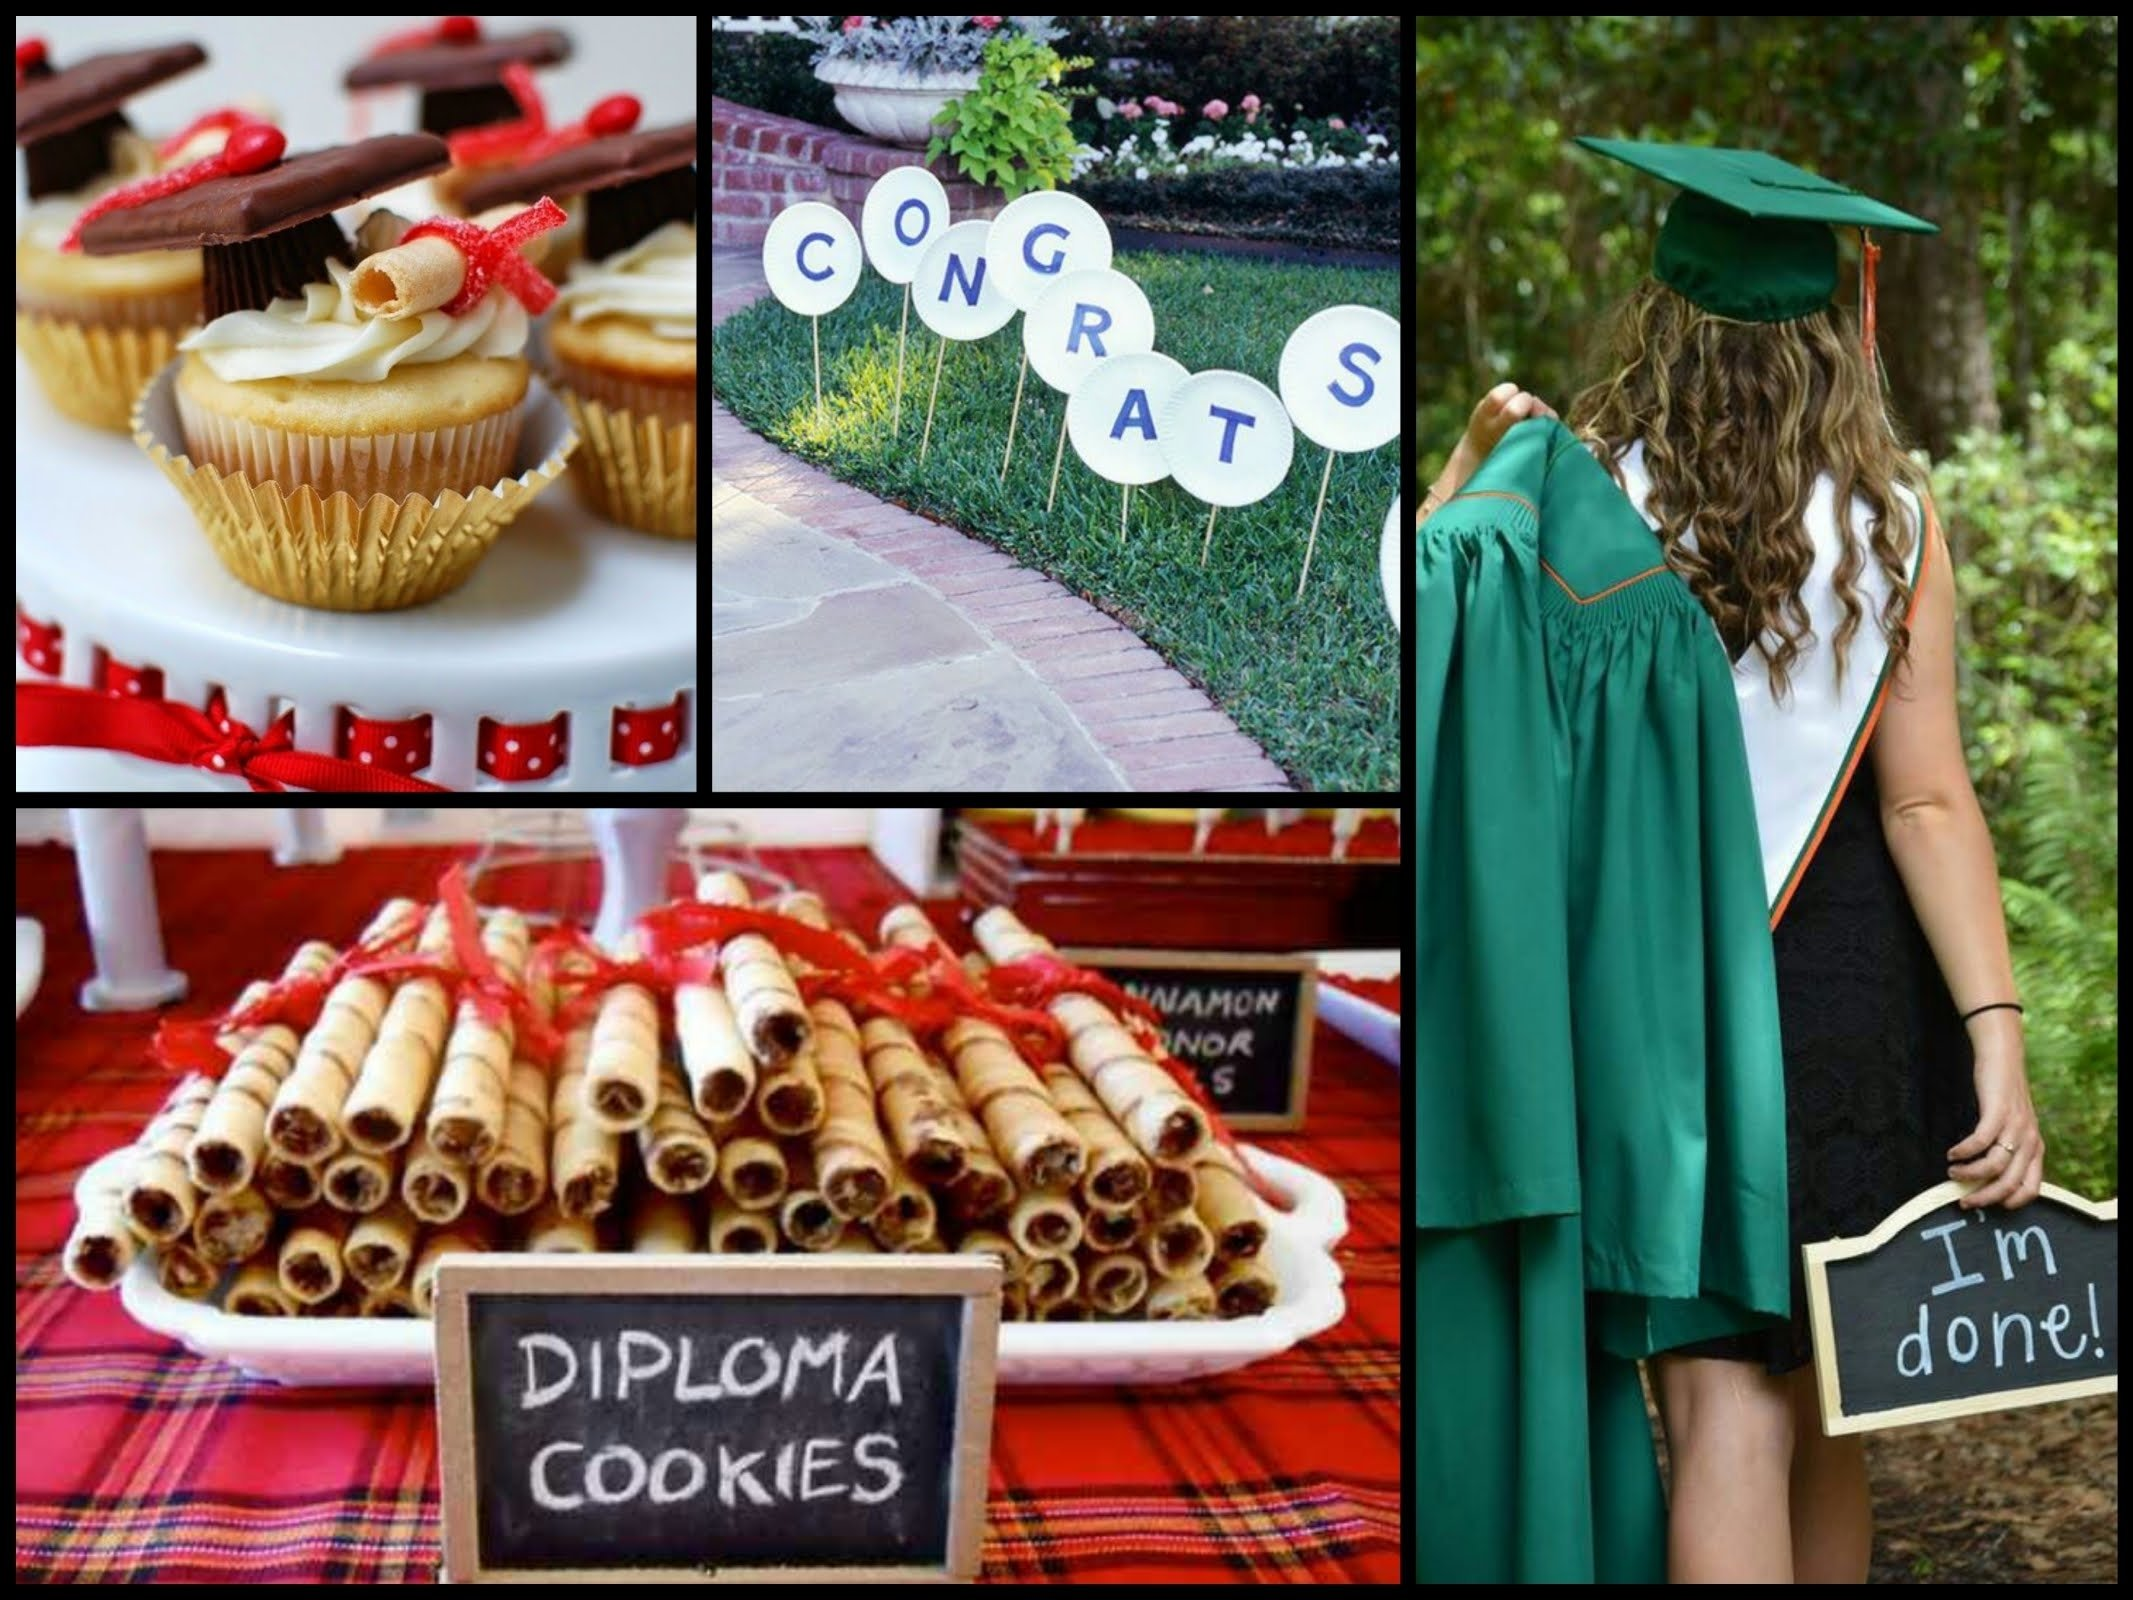 10 Elegant Ideas For Graduation Party Food 25 diy graduation party ideas youtube 2 2021